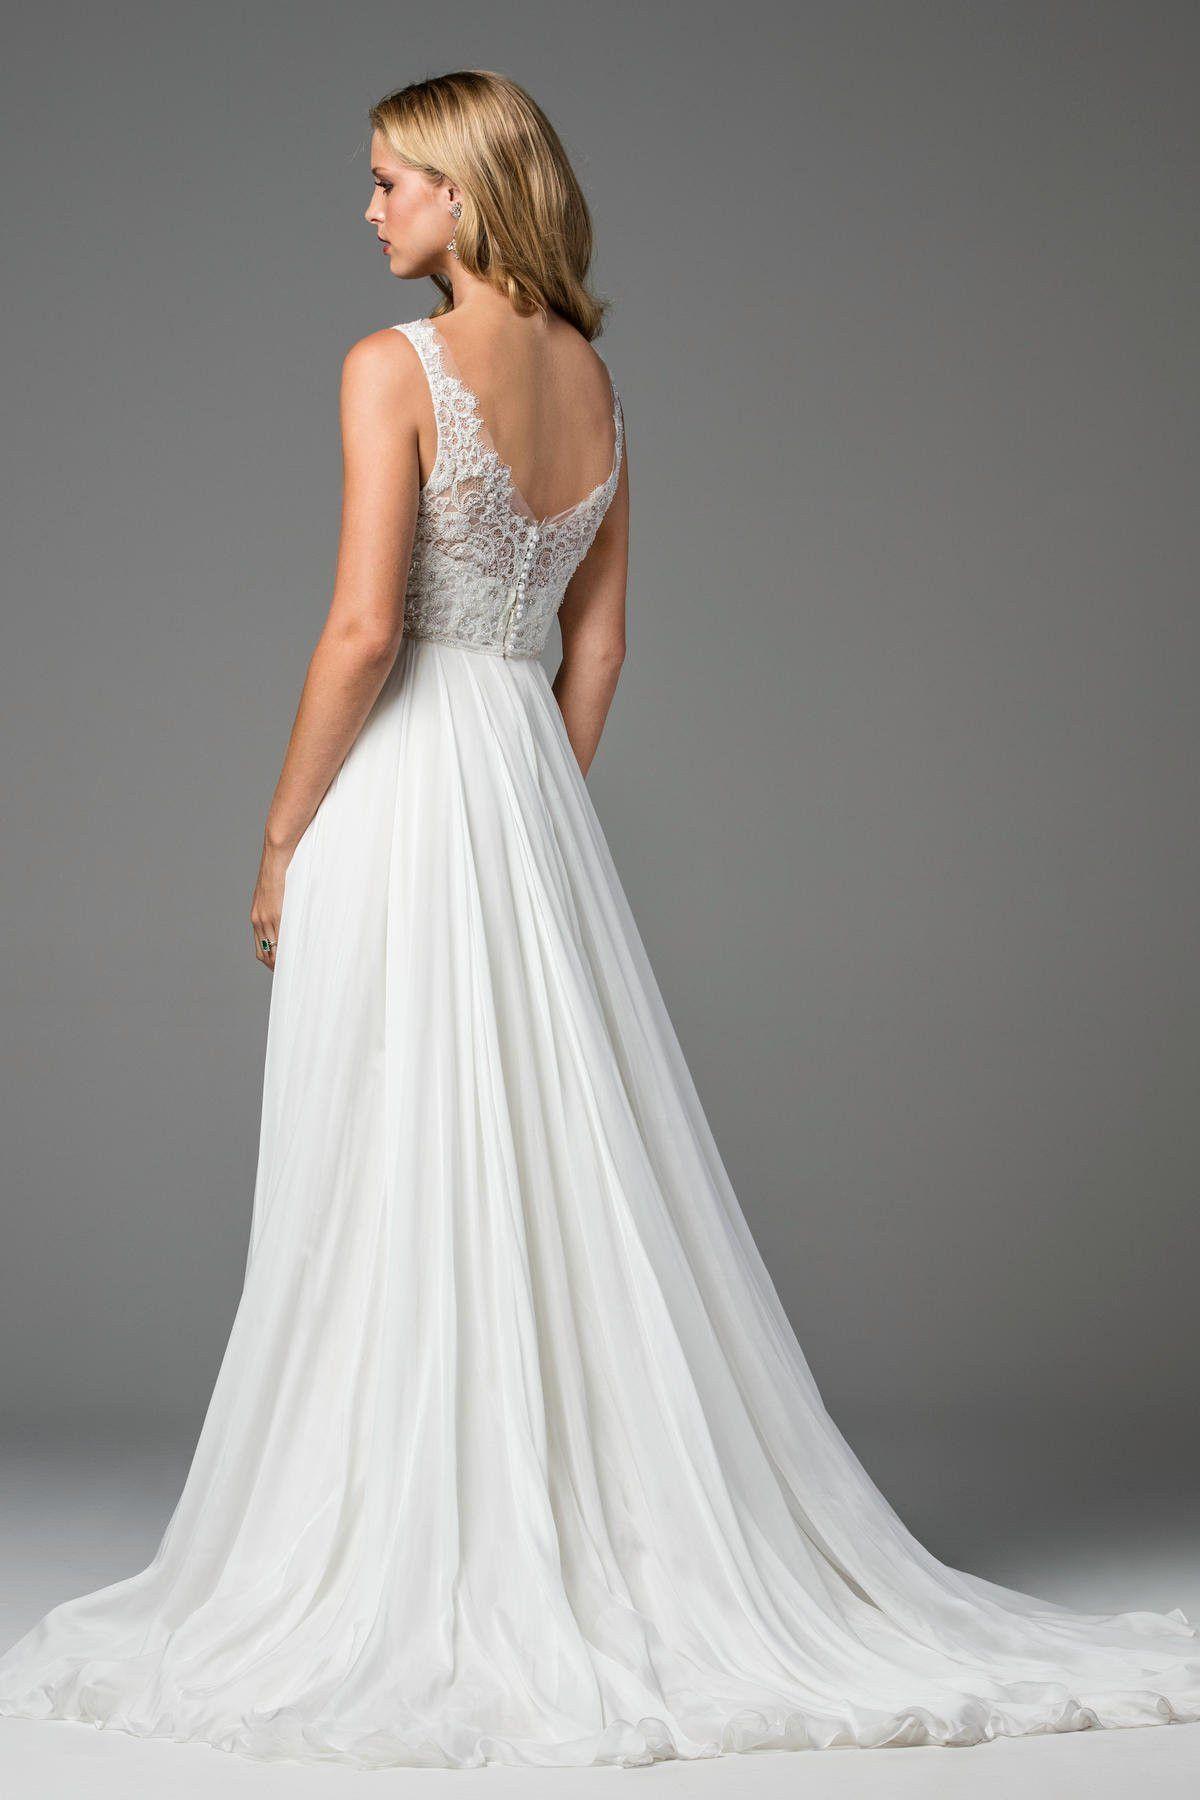 Stafford by Watters in 2020 Watters bridal, Organza